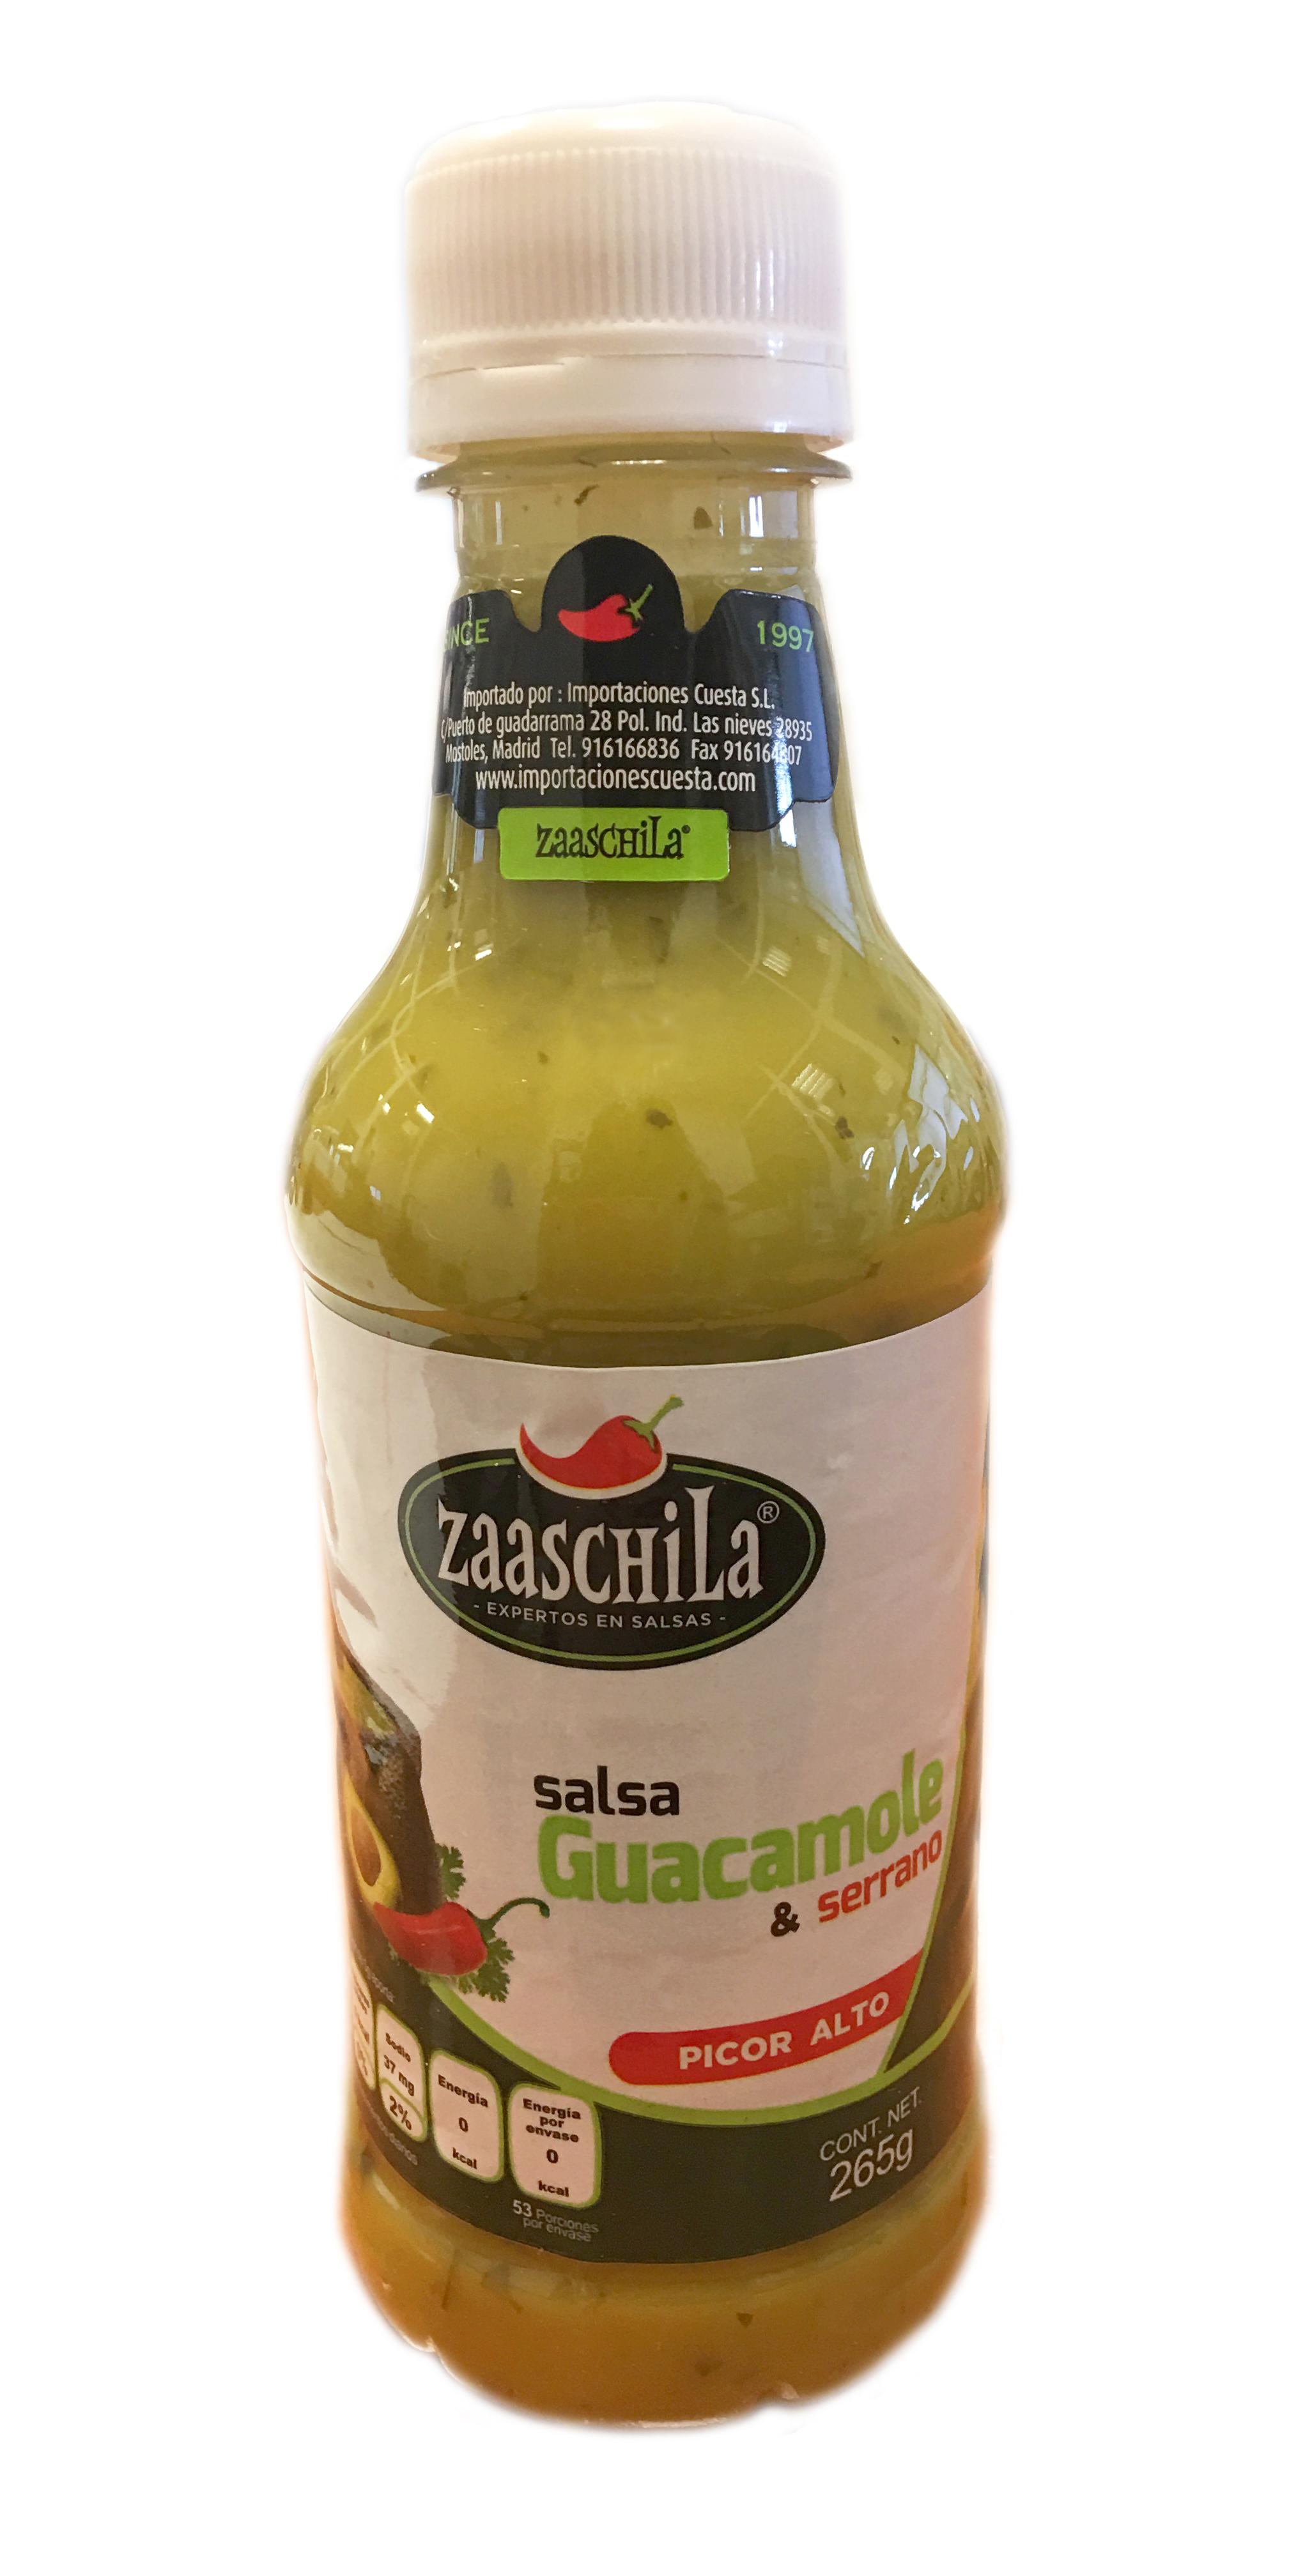 Salsa guacamole al natural Zaaschila 265g botella de plástico